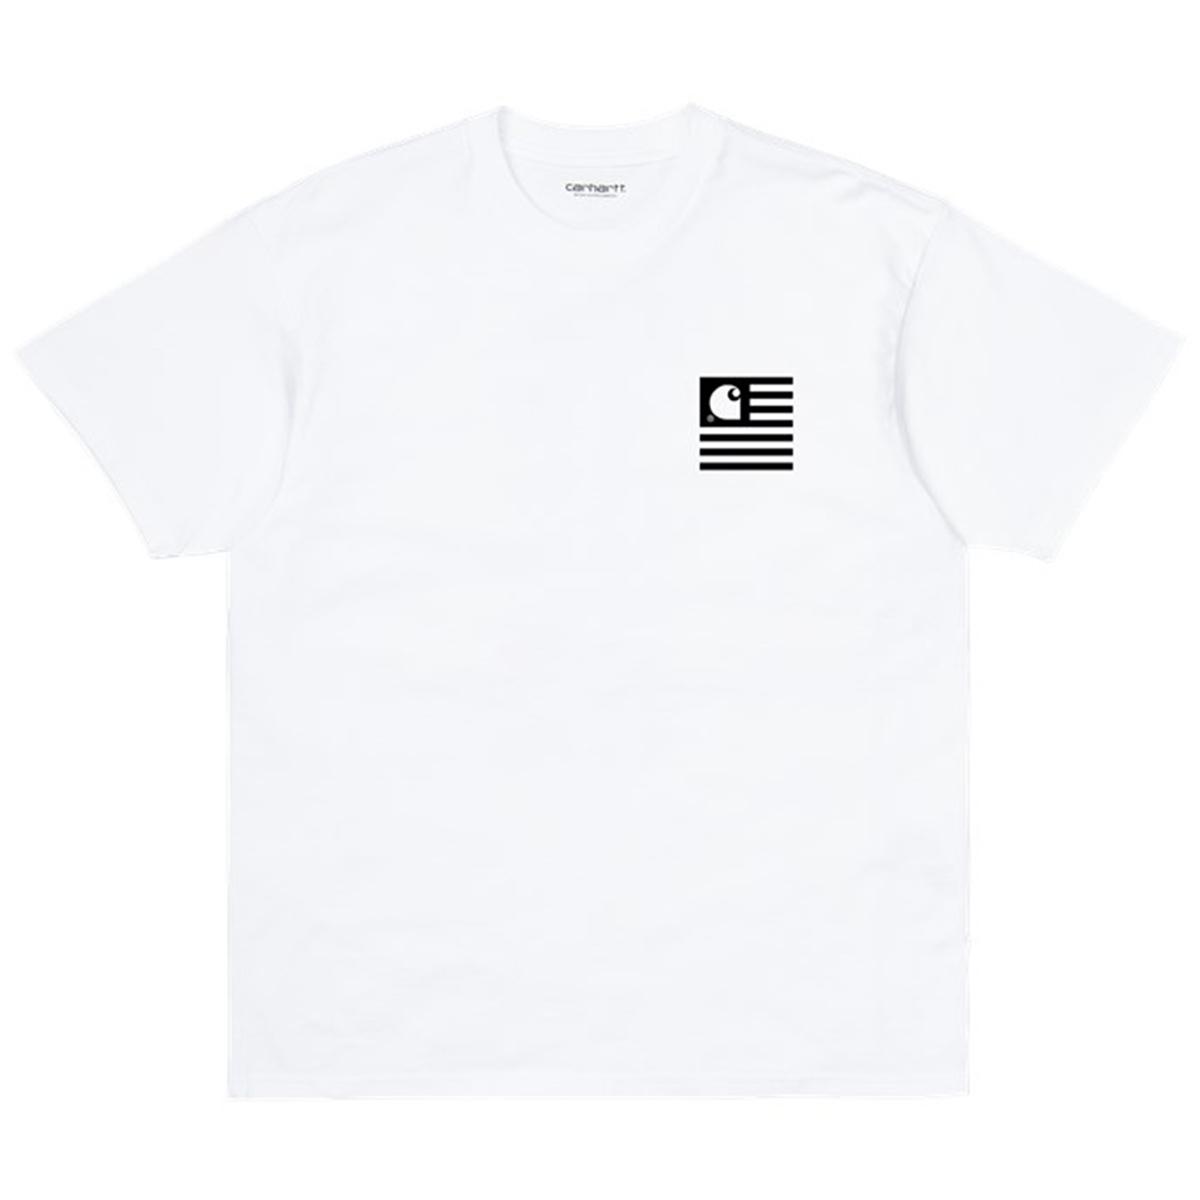 S/S Wavy State T-Shirt